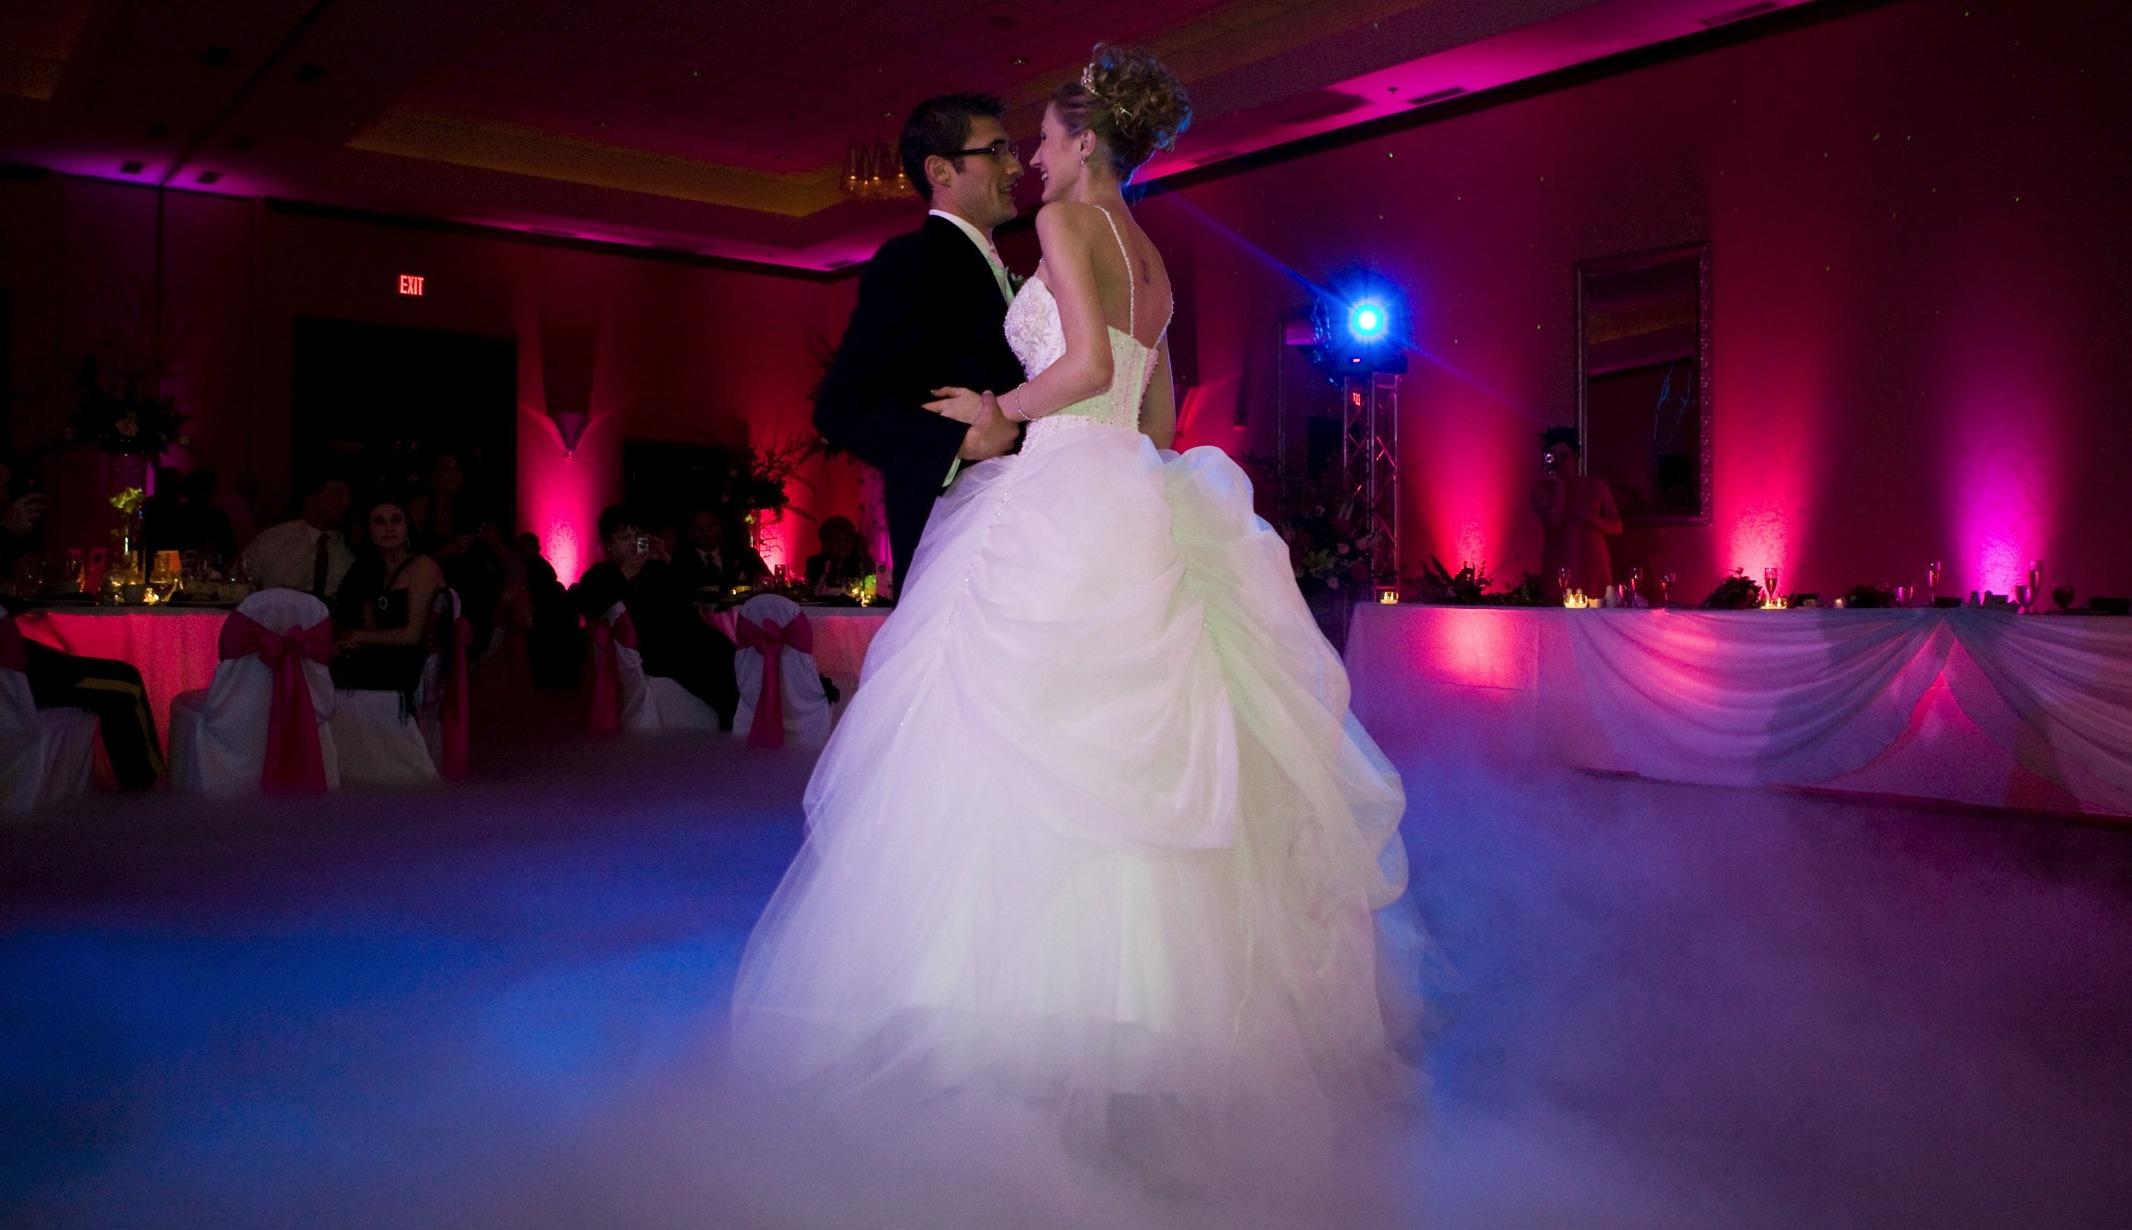 dim na venčanju